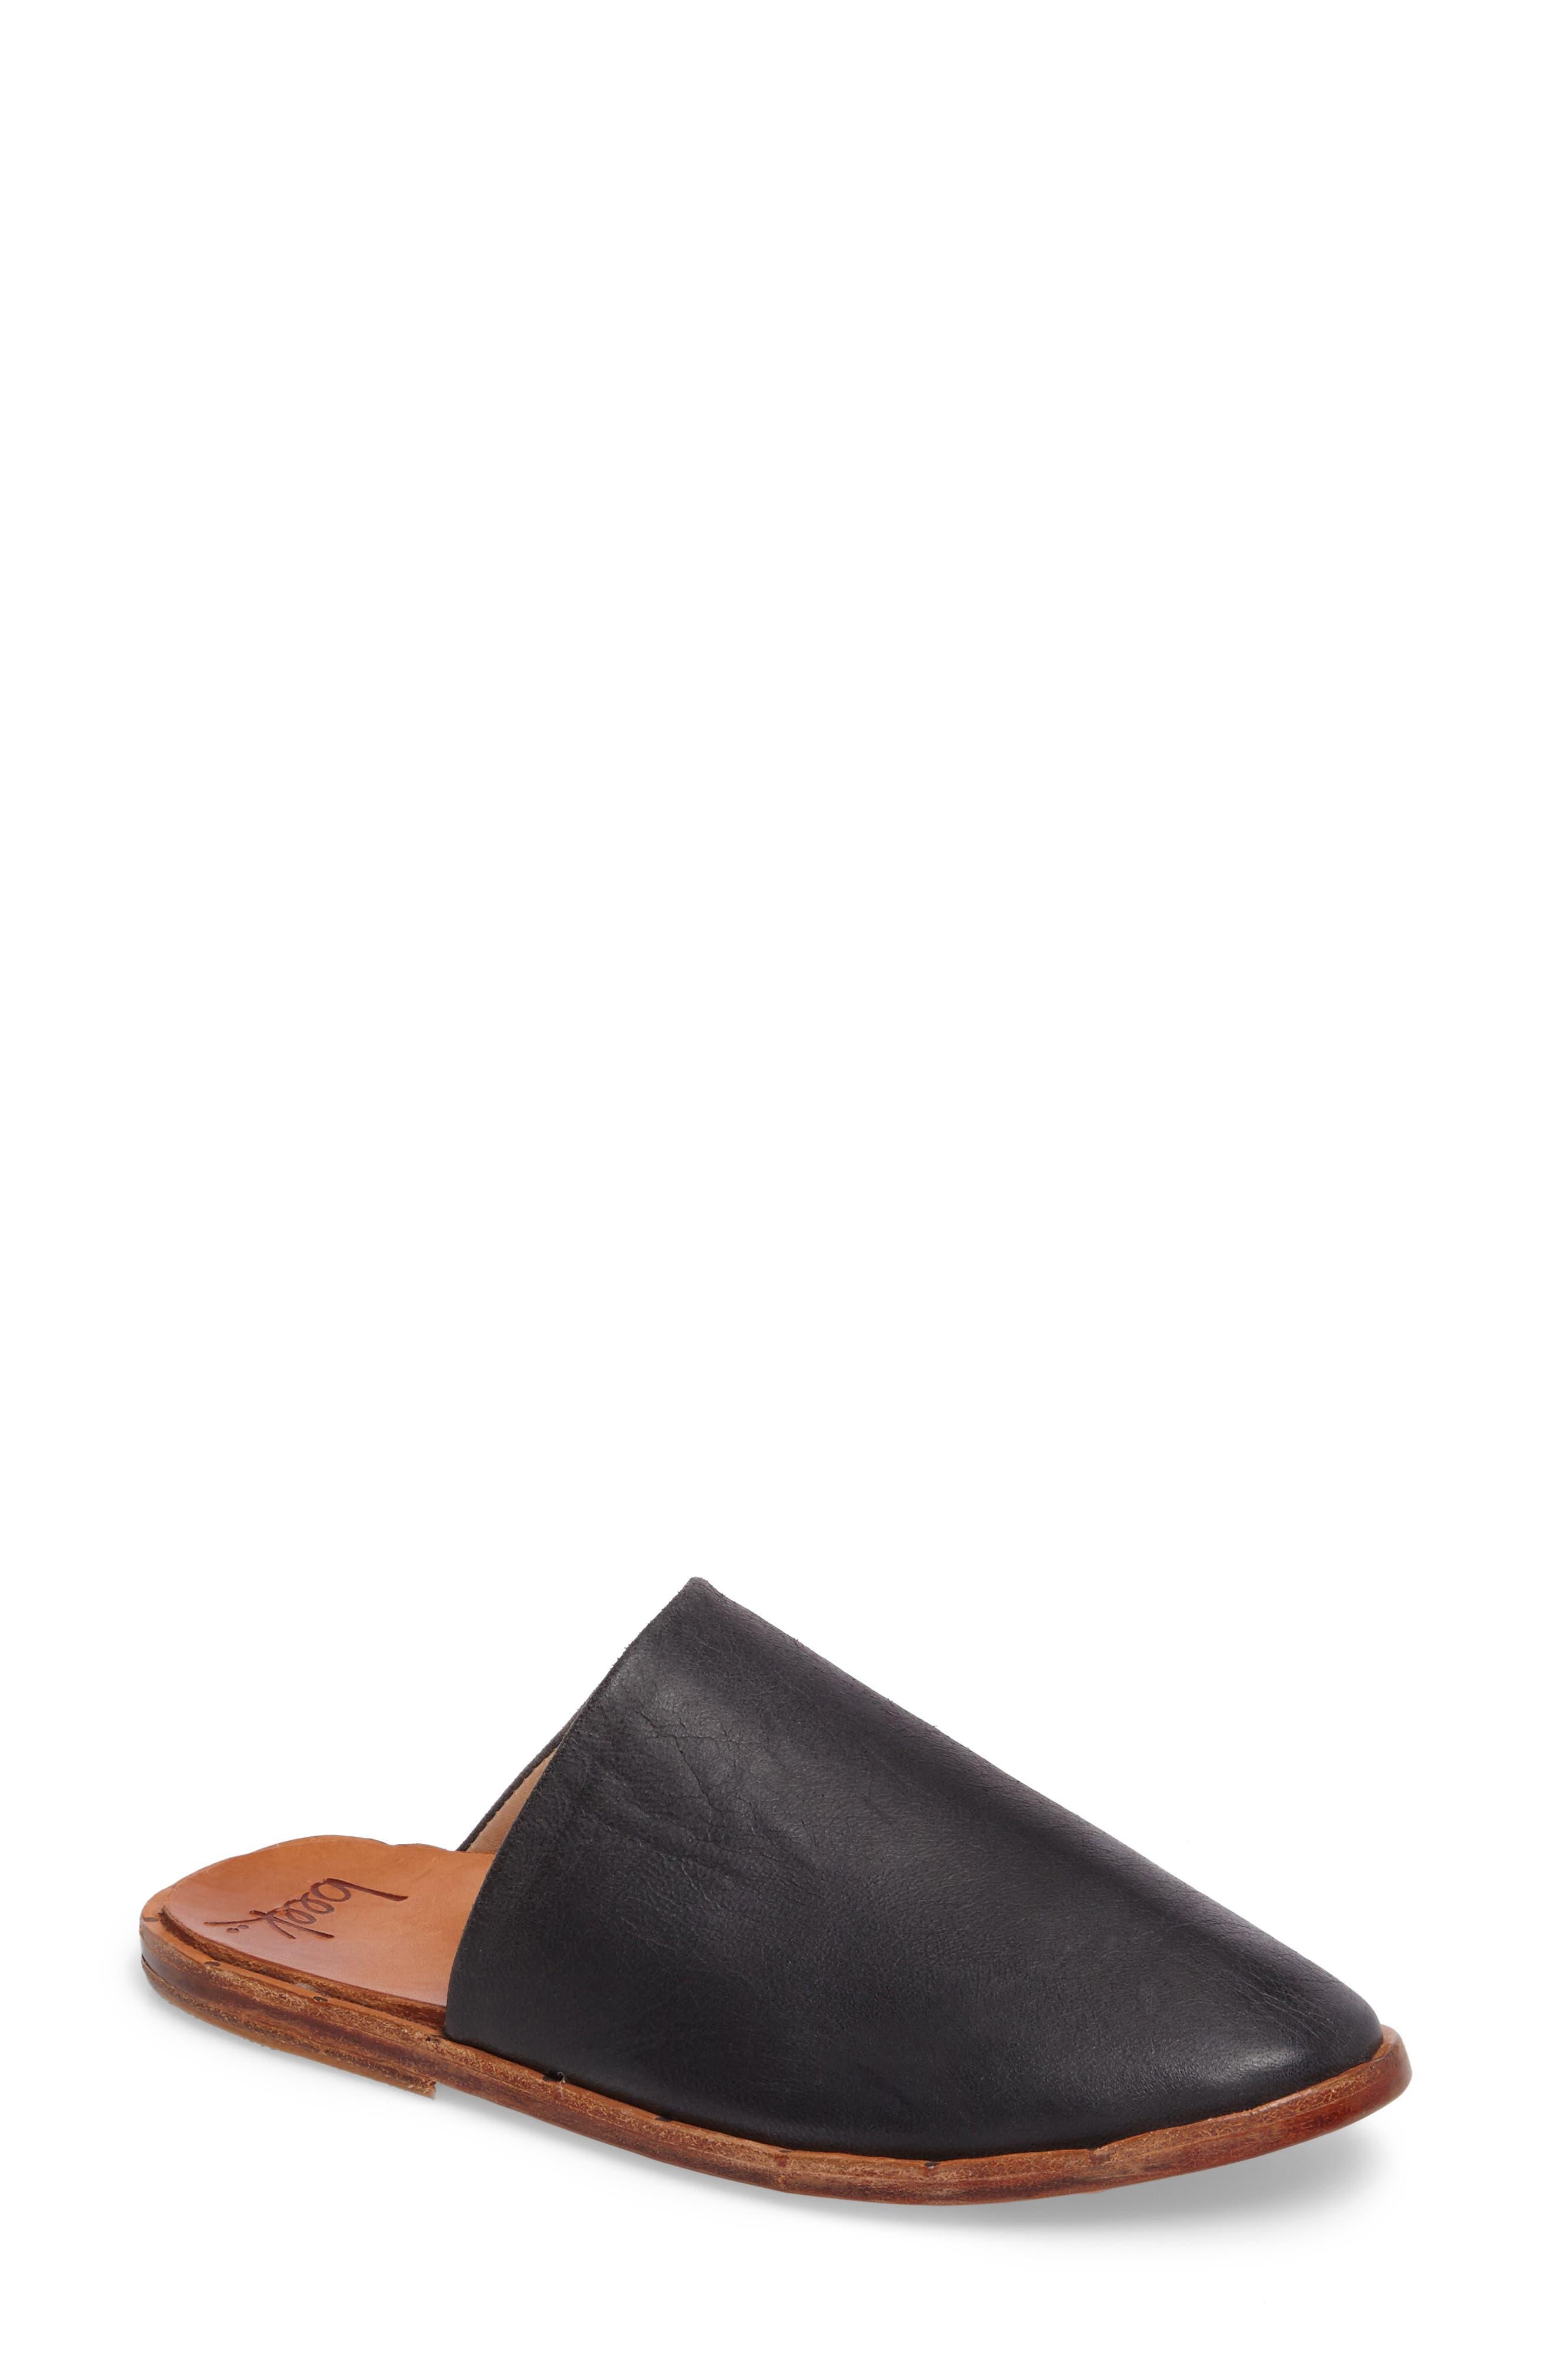 Seagull Mule,                         Main,                         color, Vintage Black Leather